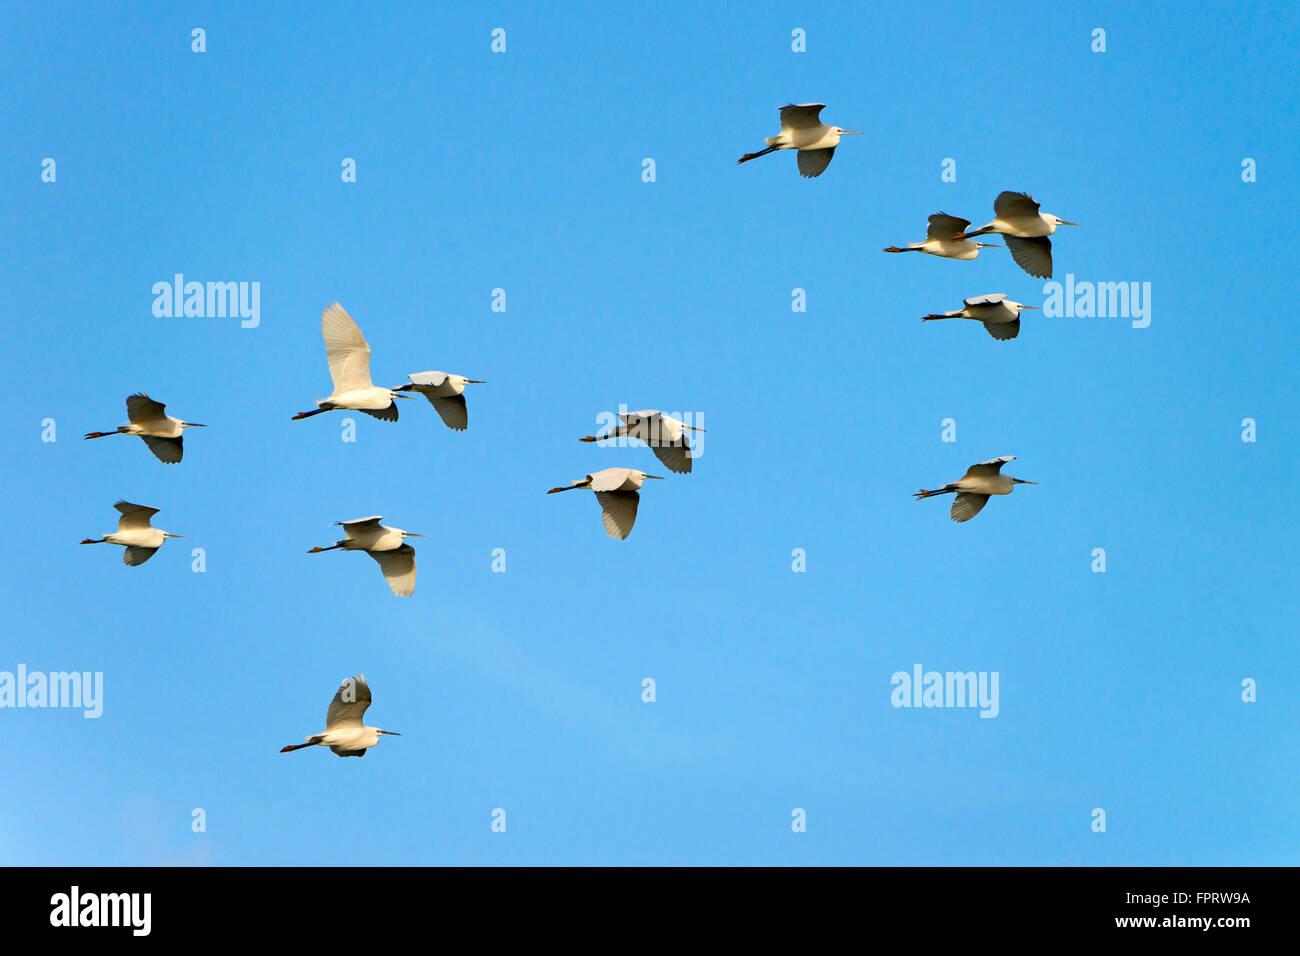 Little Egret (Egretta garzetta), flock of birds in flight, Riu Mannu, Sardinia, Italy - Stock Image